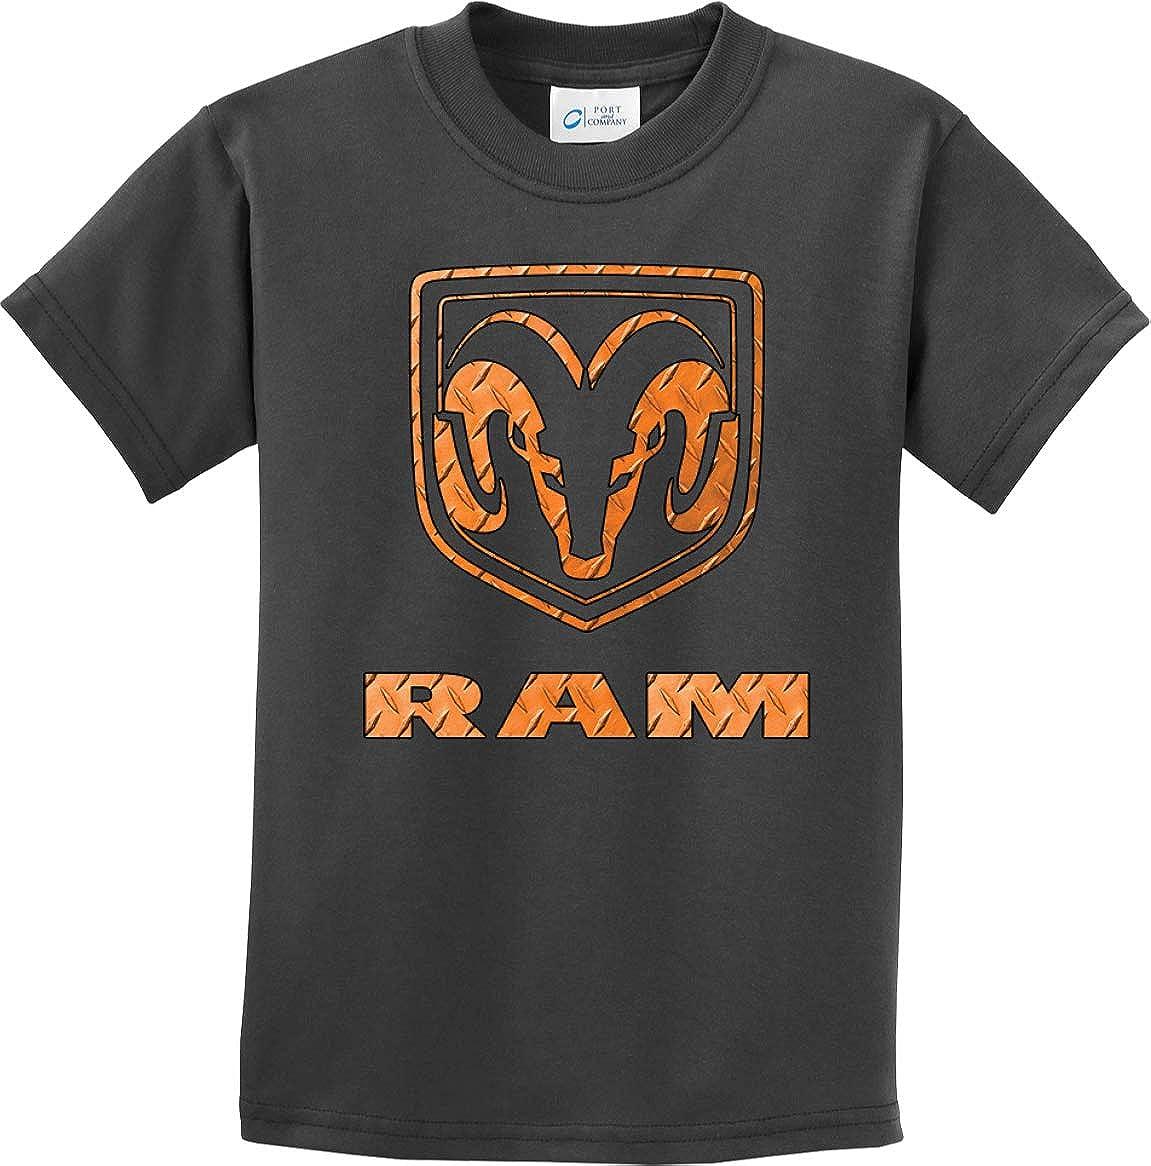 Kids Dodge Ram T-Shirt Diamond Plate Logo Youth Tee